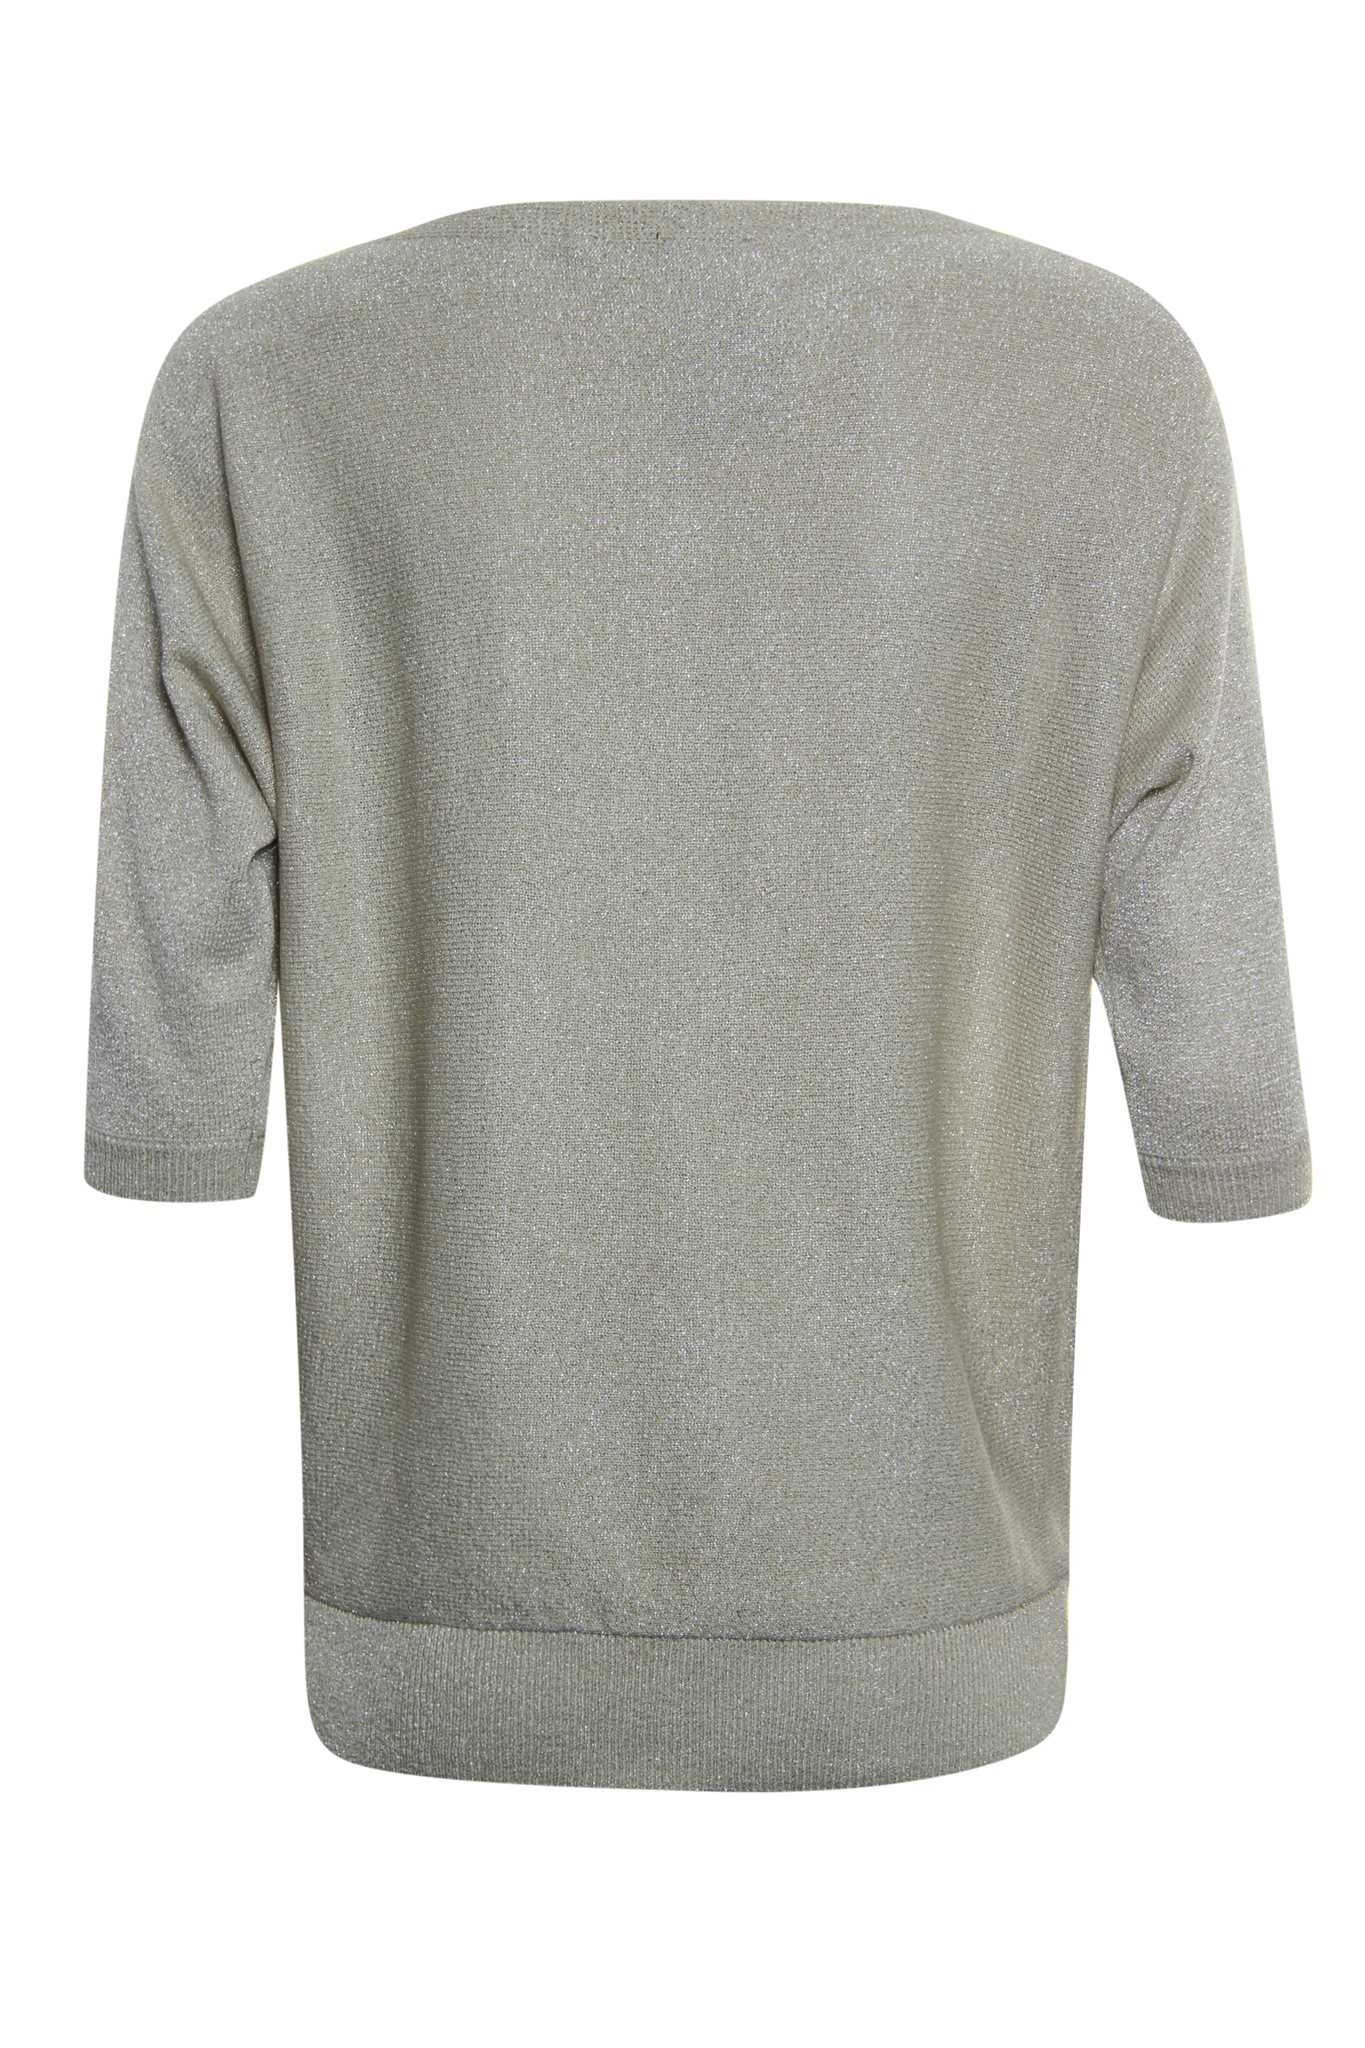 Sweater Contrast